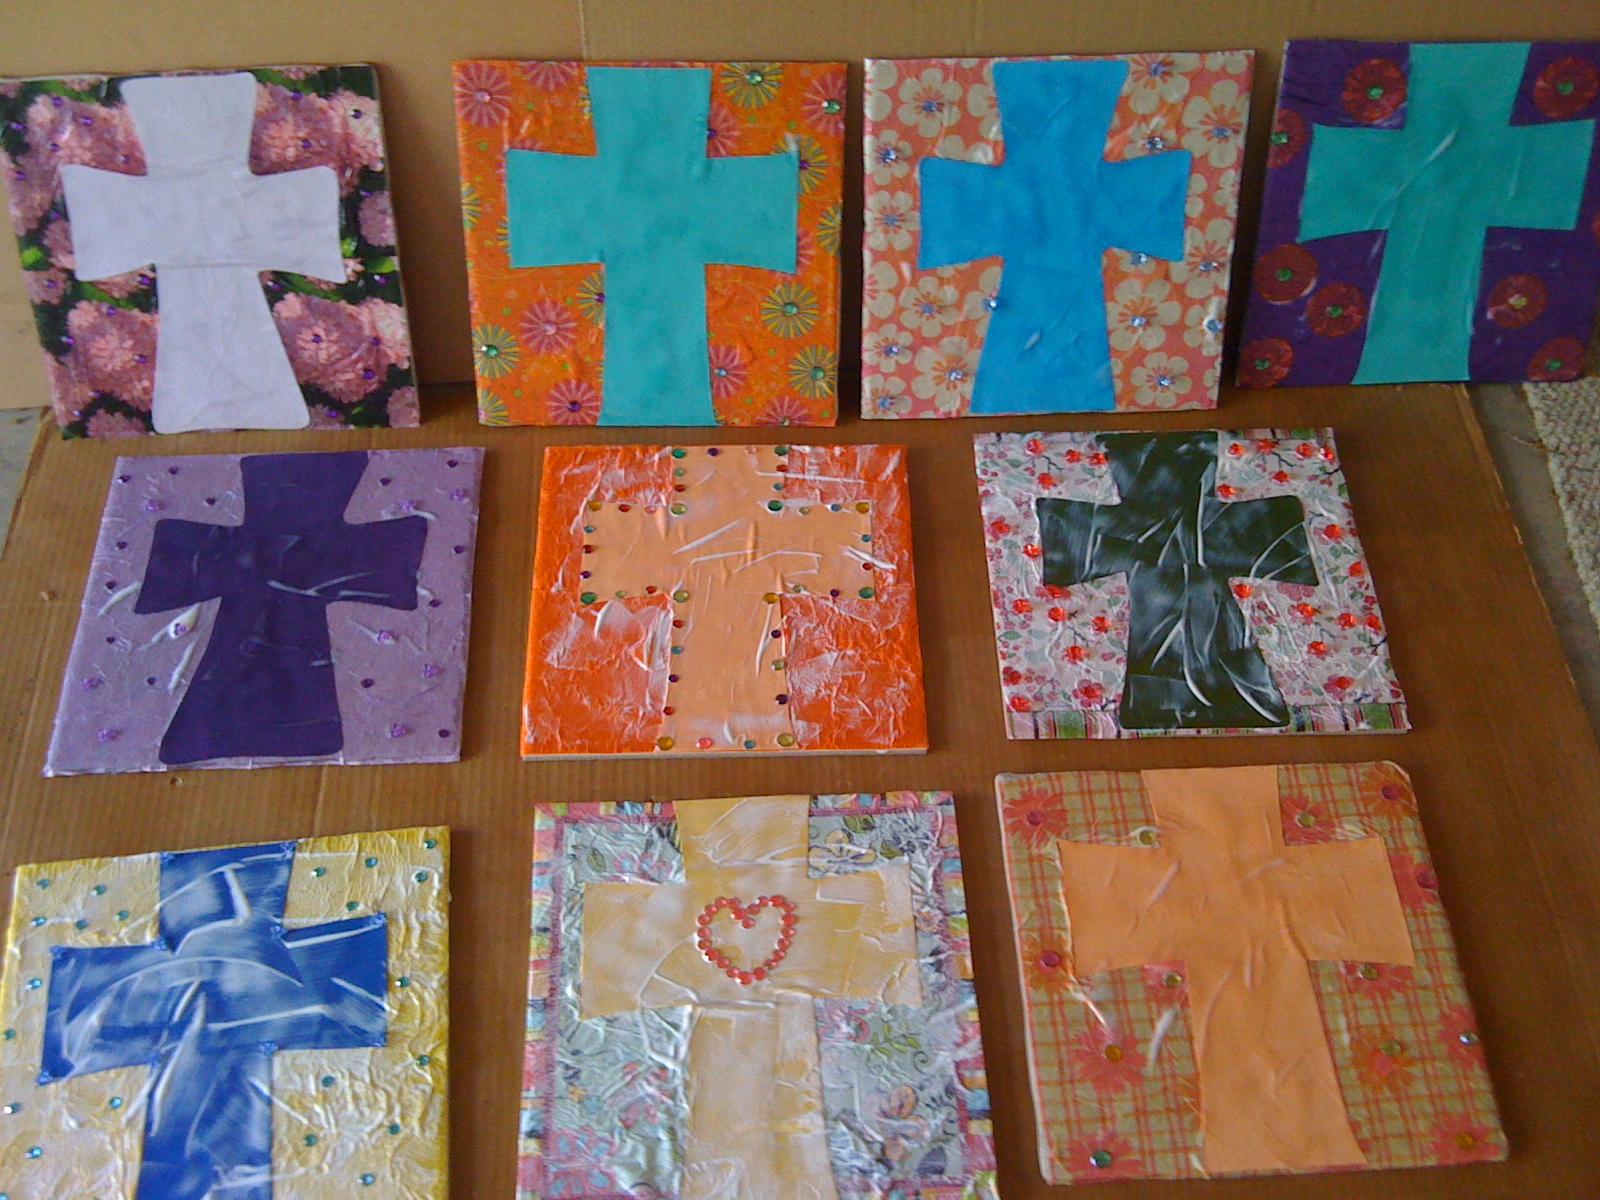 Artsy Theology Ceramic Tile Art